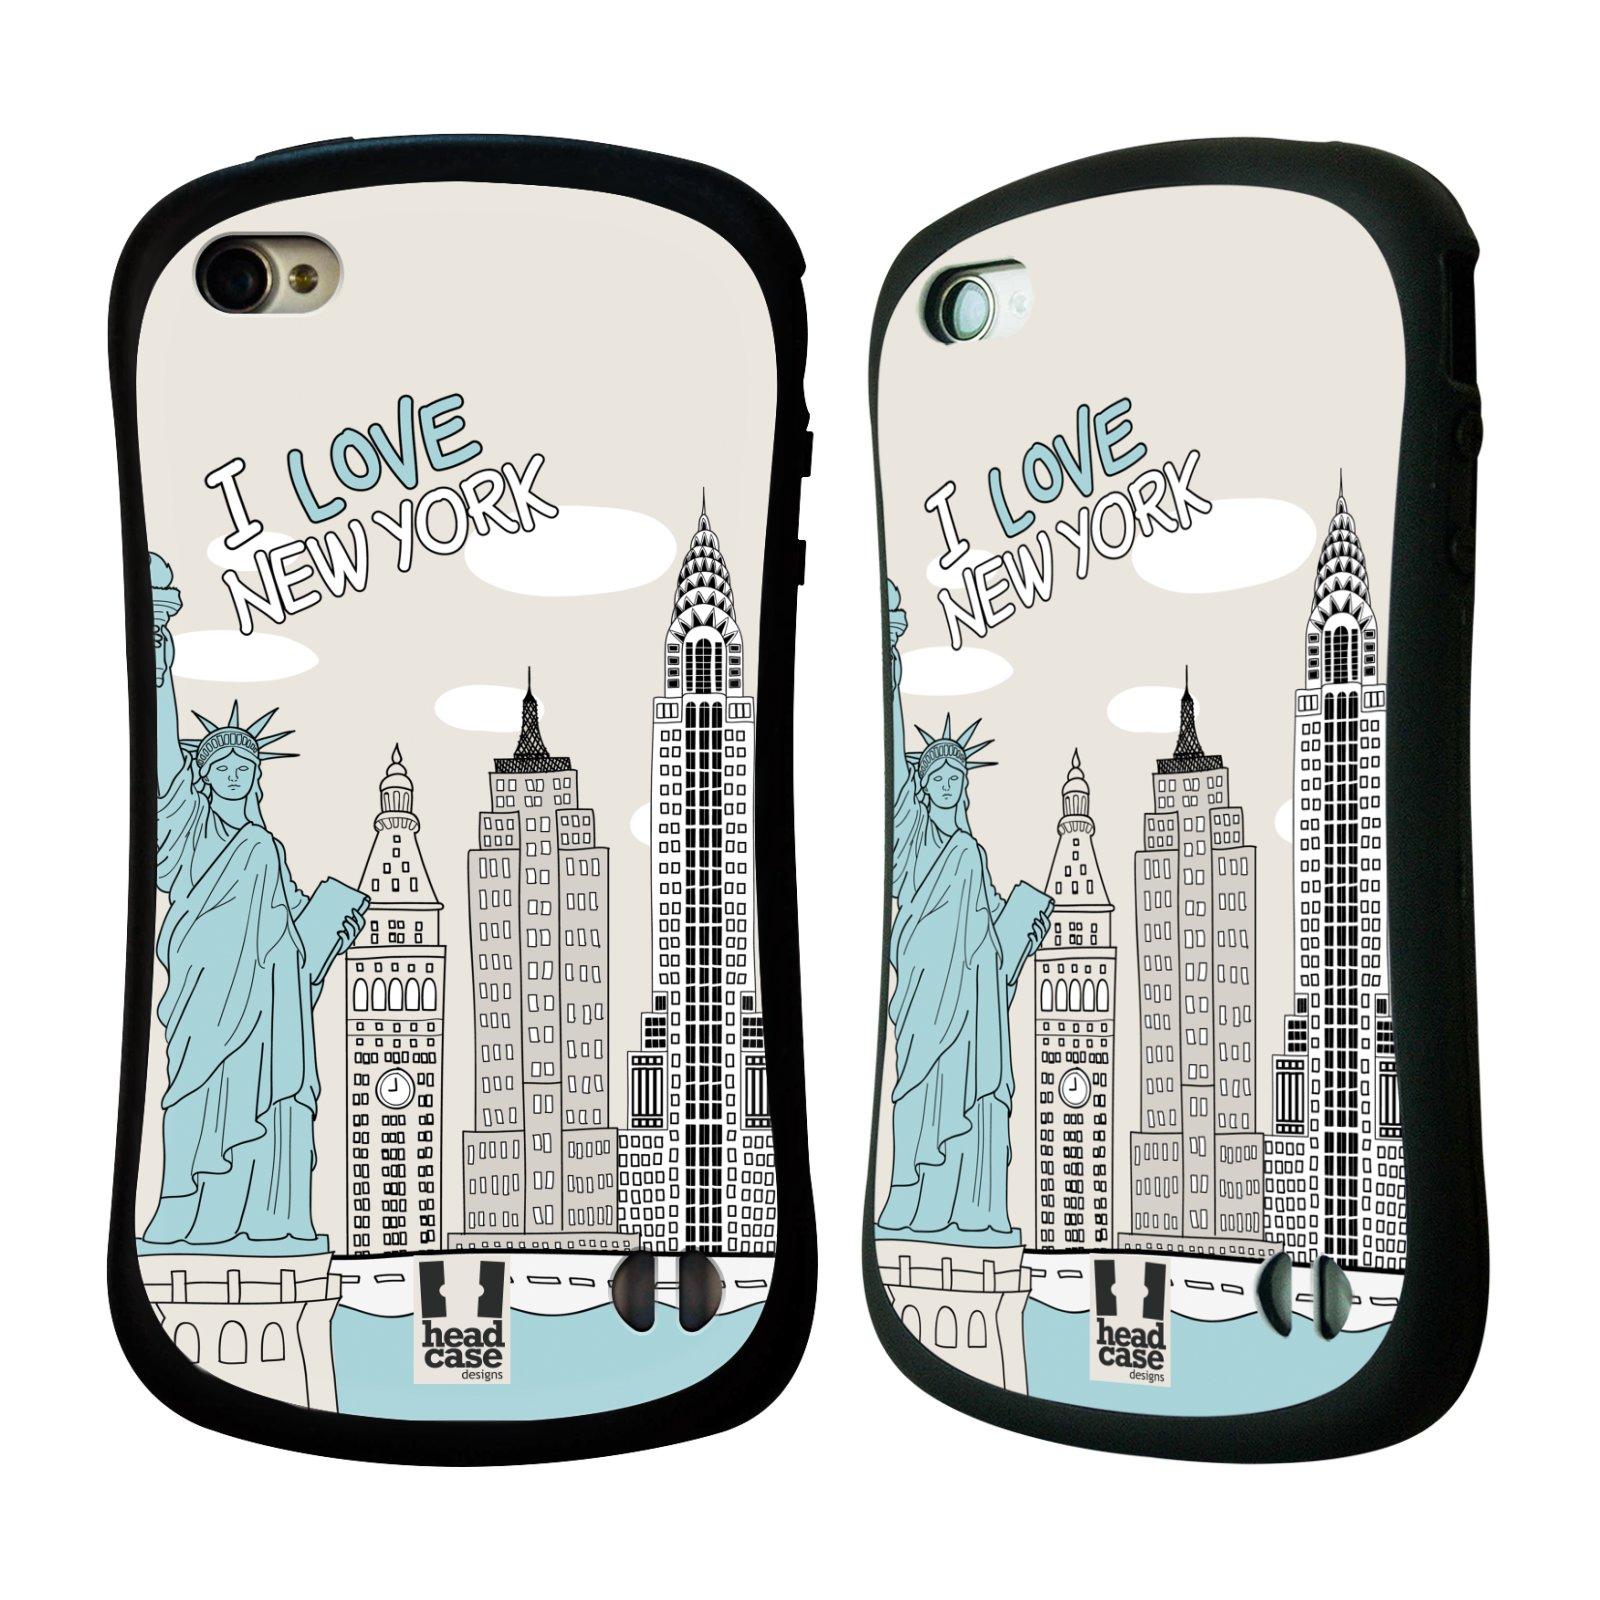 HEAD CASE silikon/plast odolný obal na mobil Apple Iphone 4/4S vzor Kreslená městečka MODRÁ, USA, New York, I LOVE NEW YORK